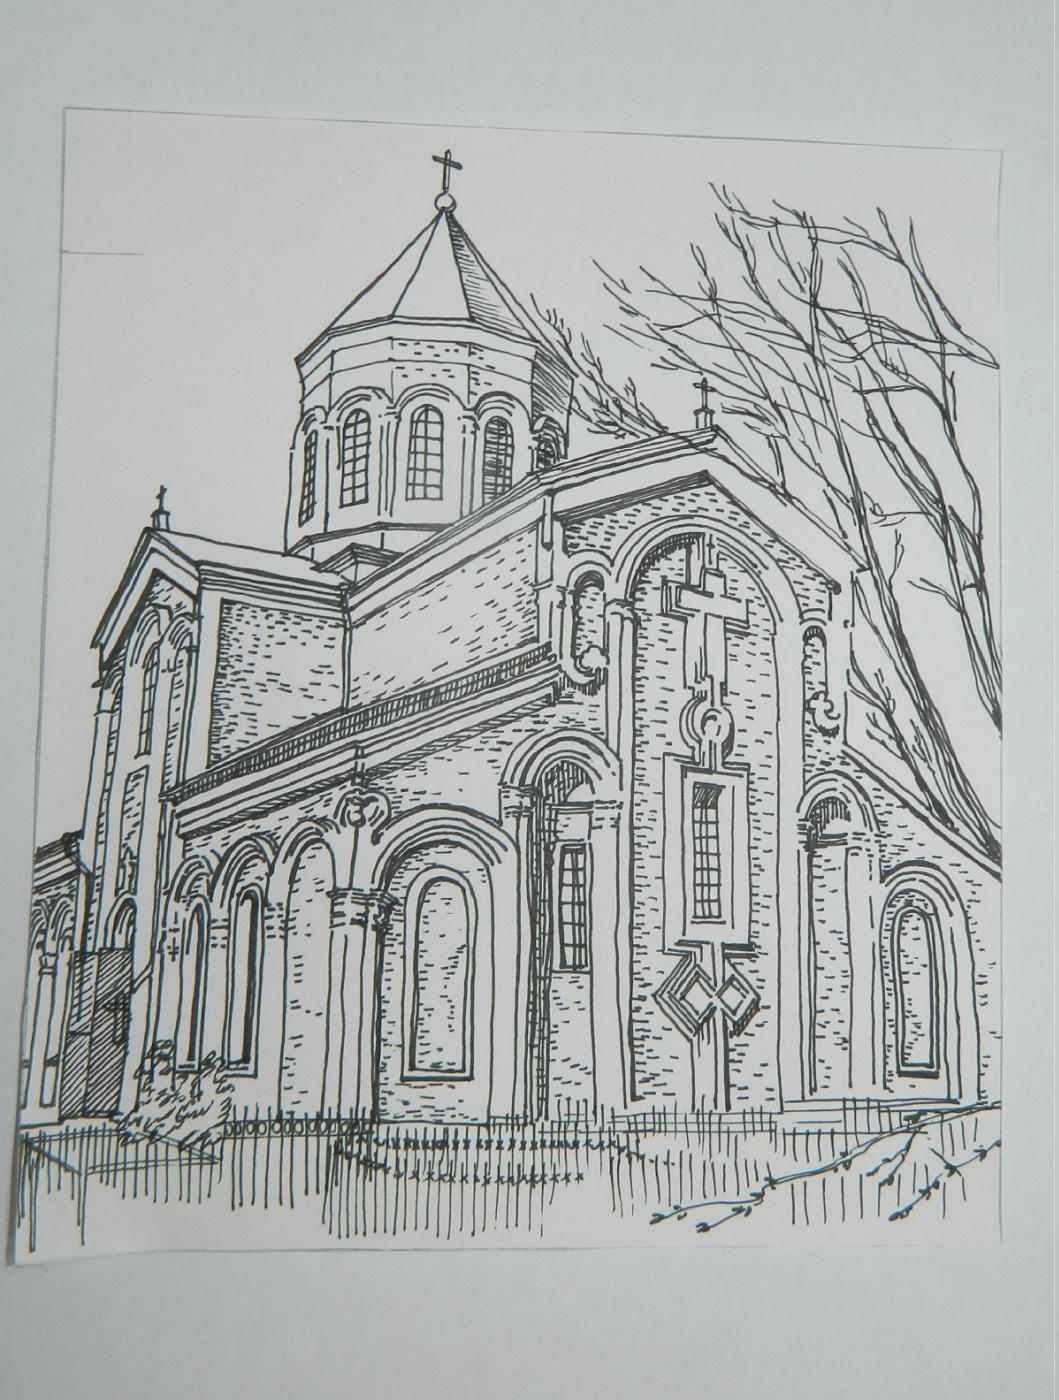 Olga Evgenevna Klimova. Gregorian Church on Kayani St. Rostov-on-Don